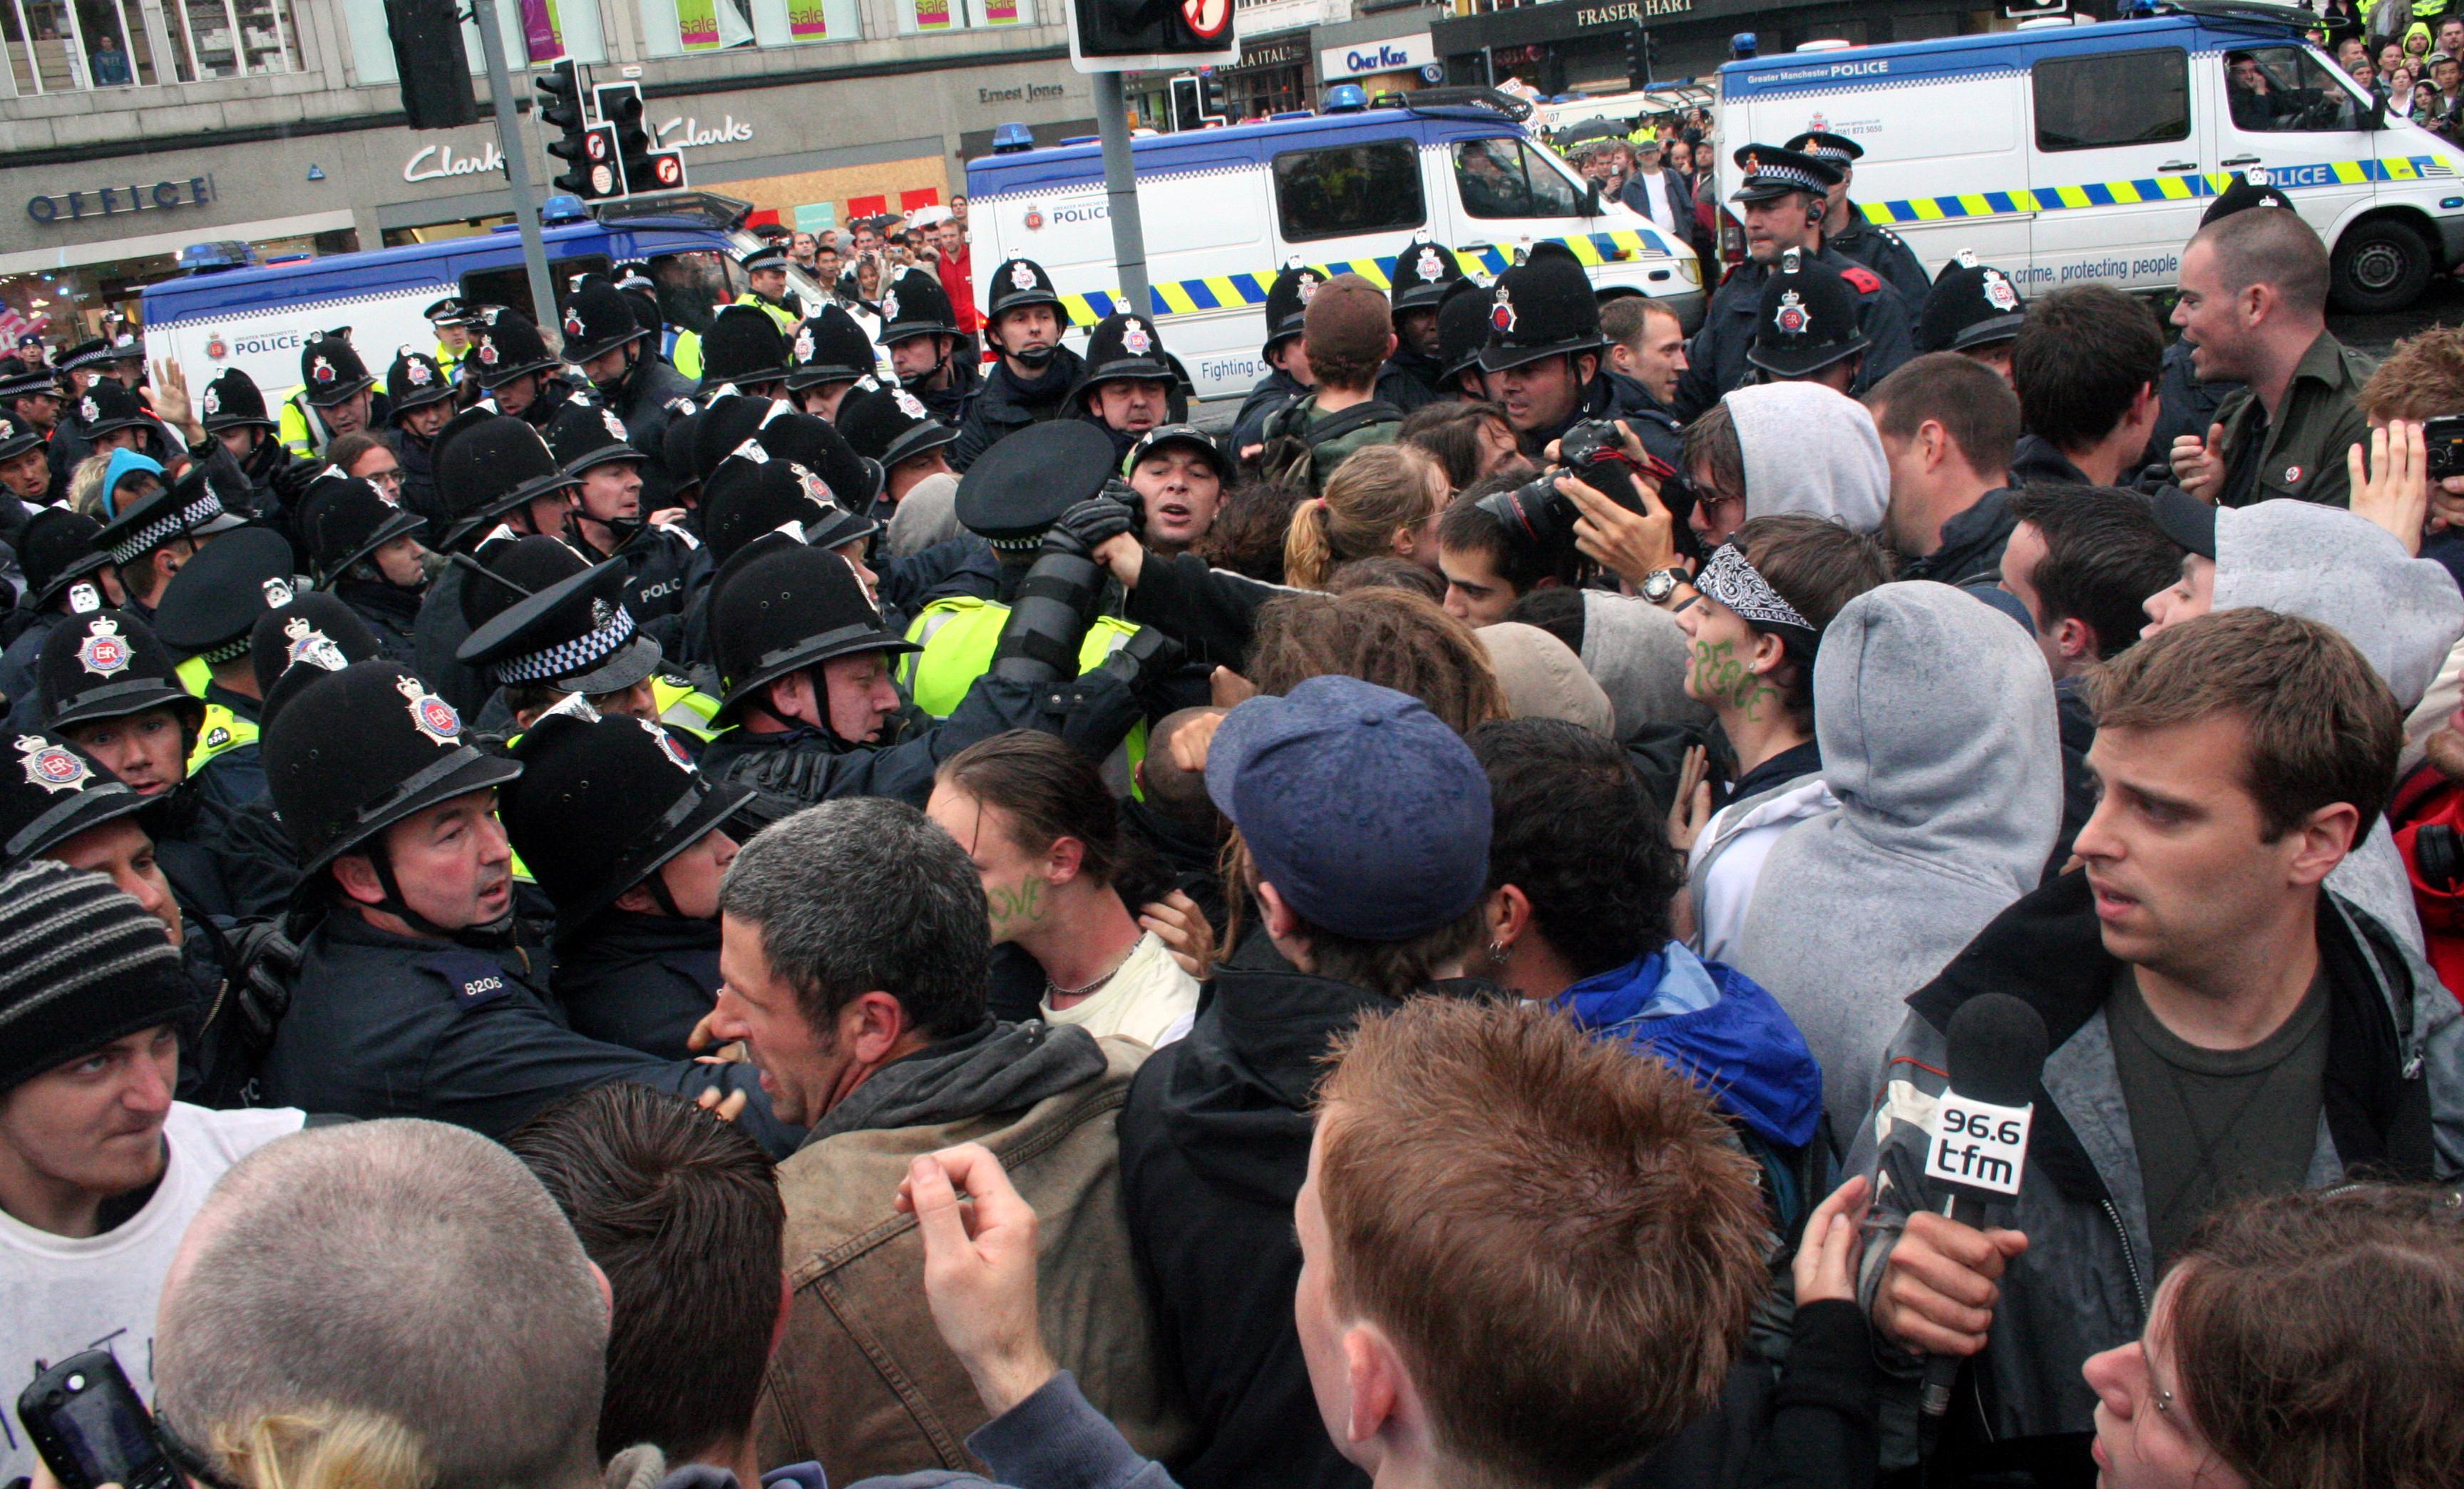 EdinburghProtests1.jpg